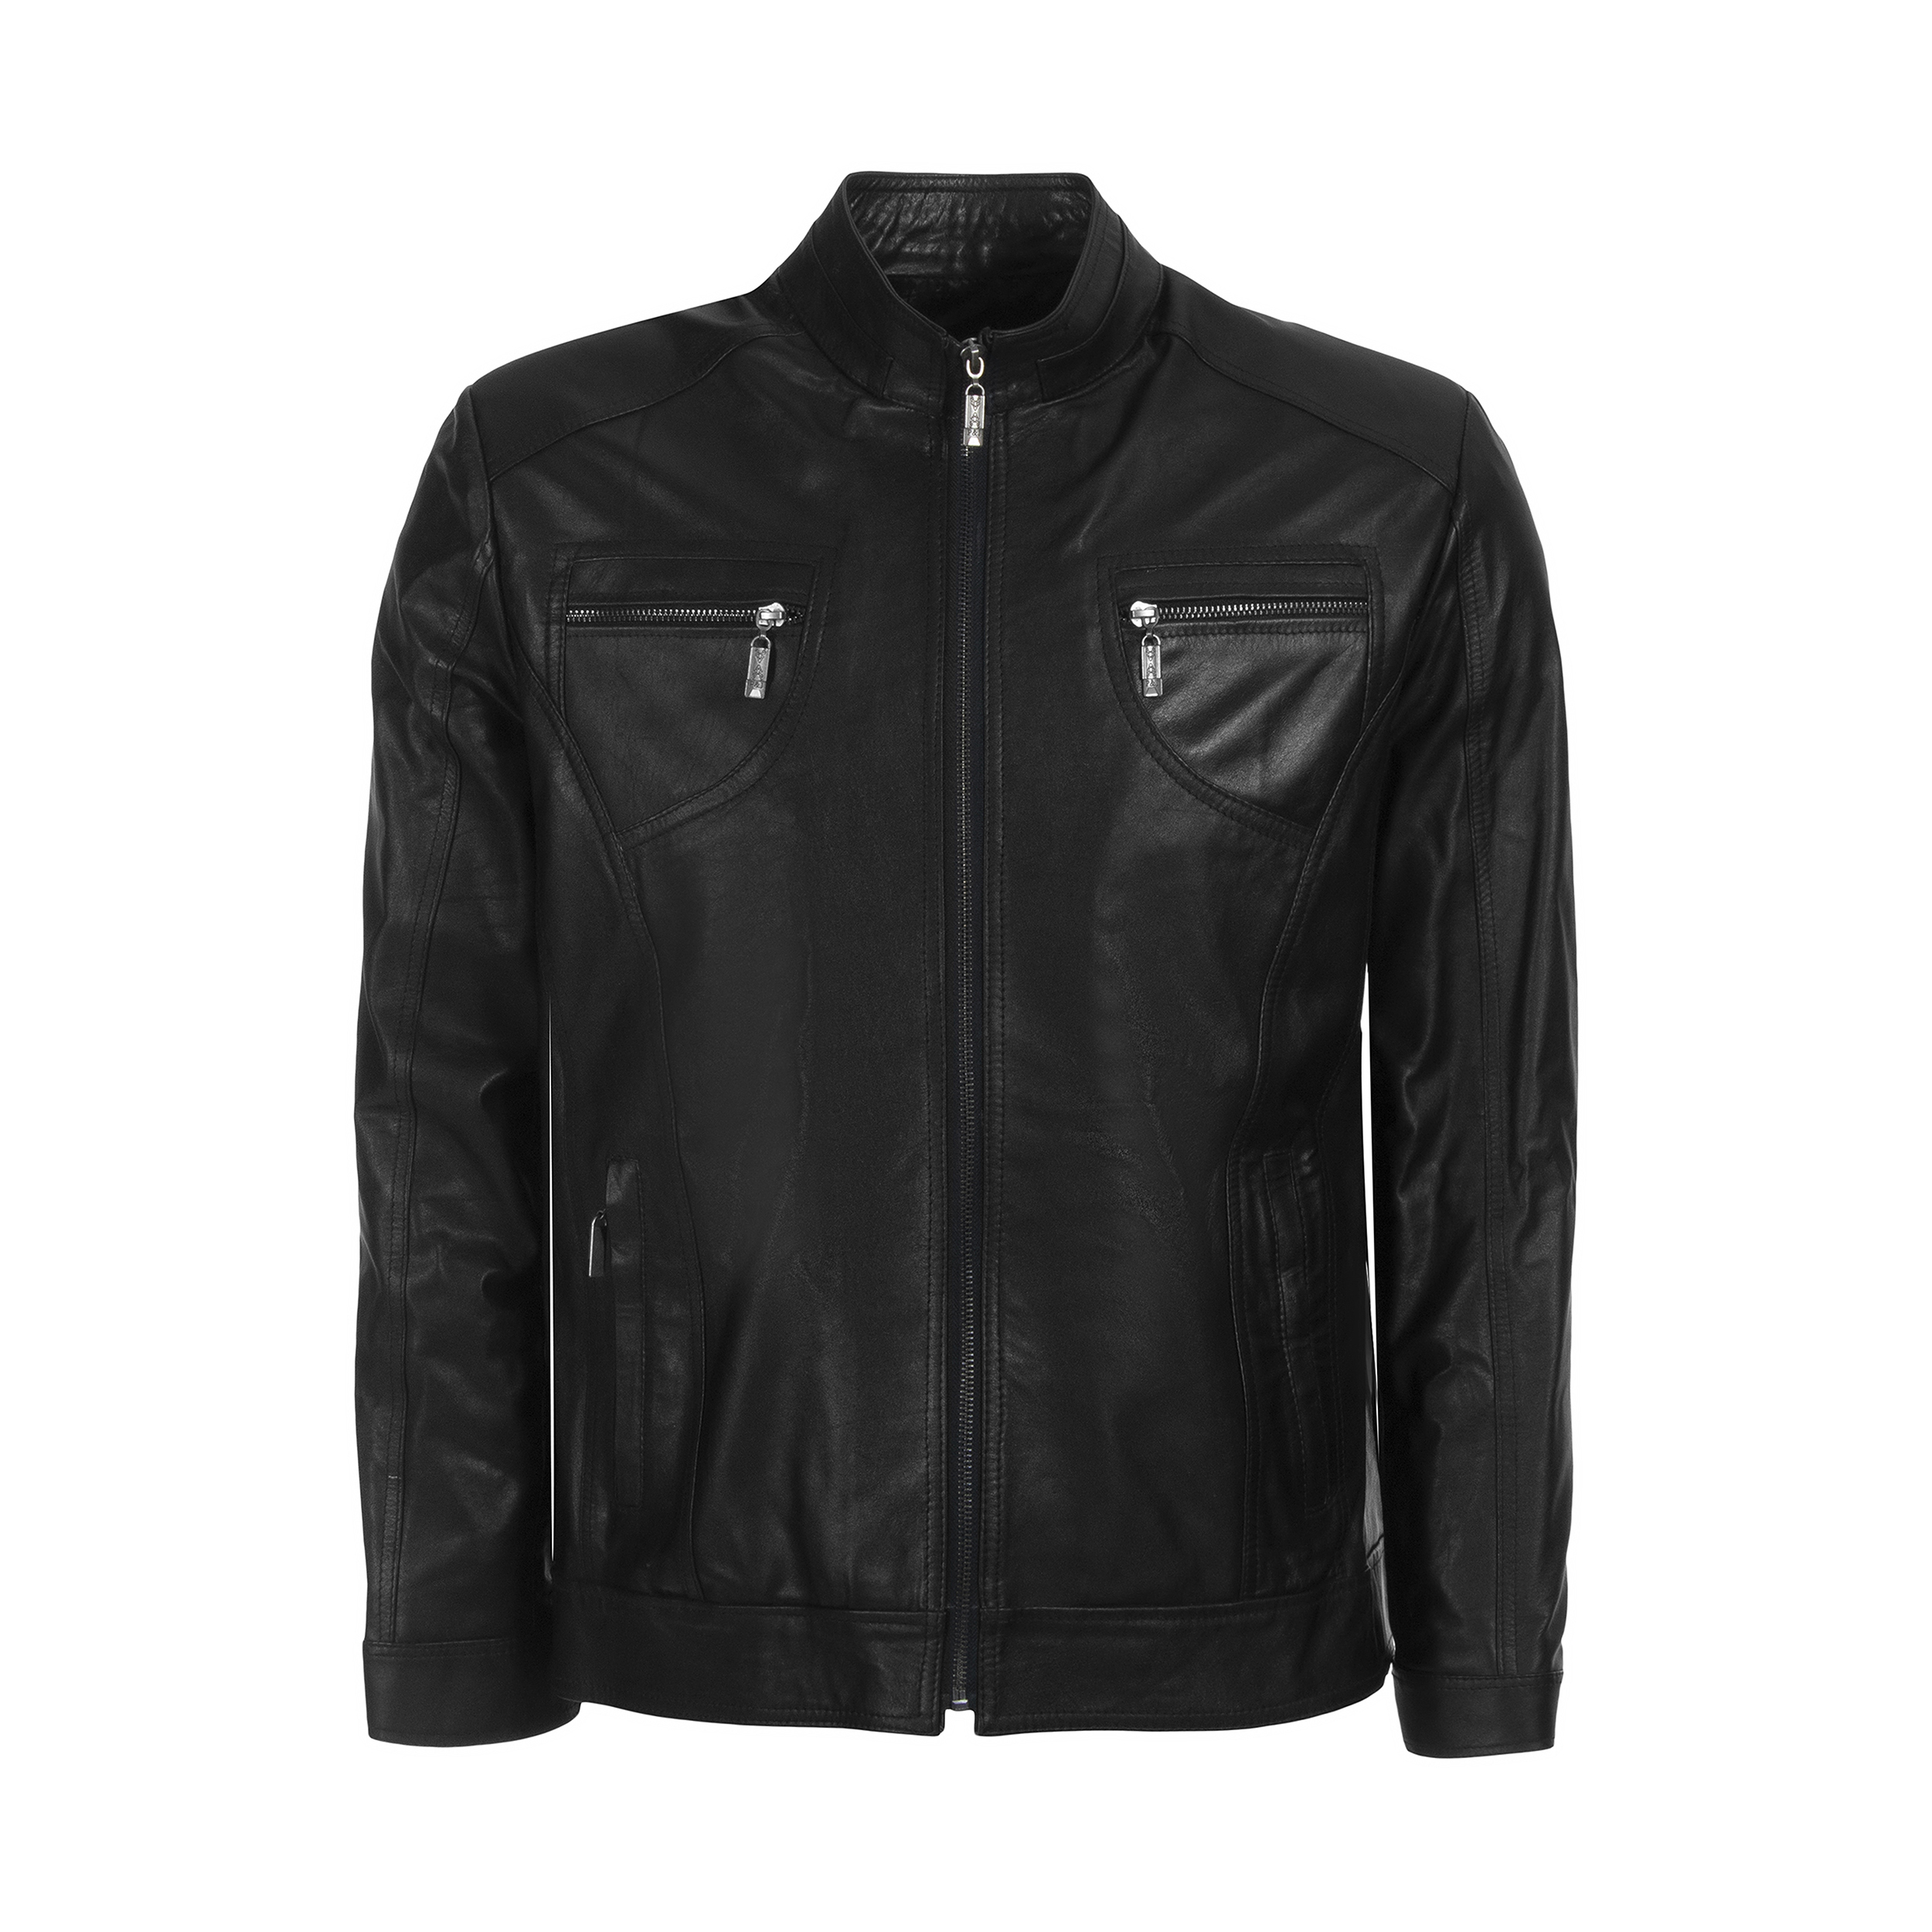 Men leather jacket, code 02